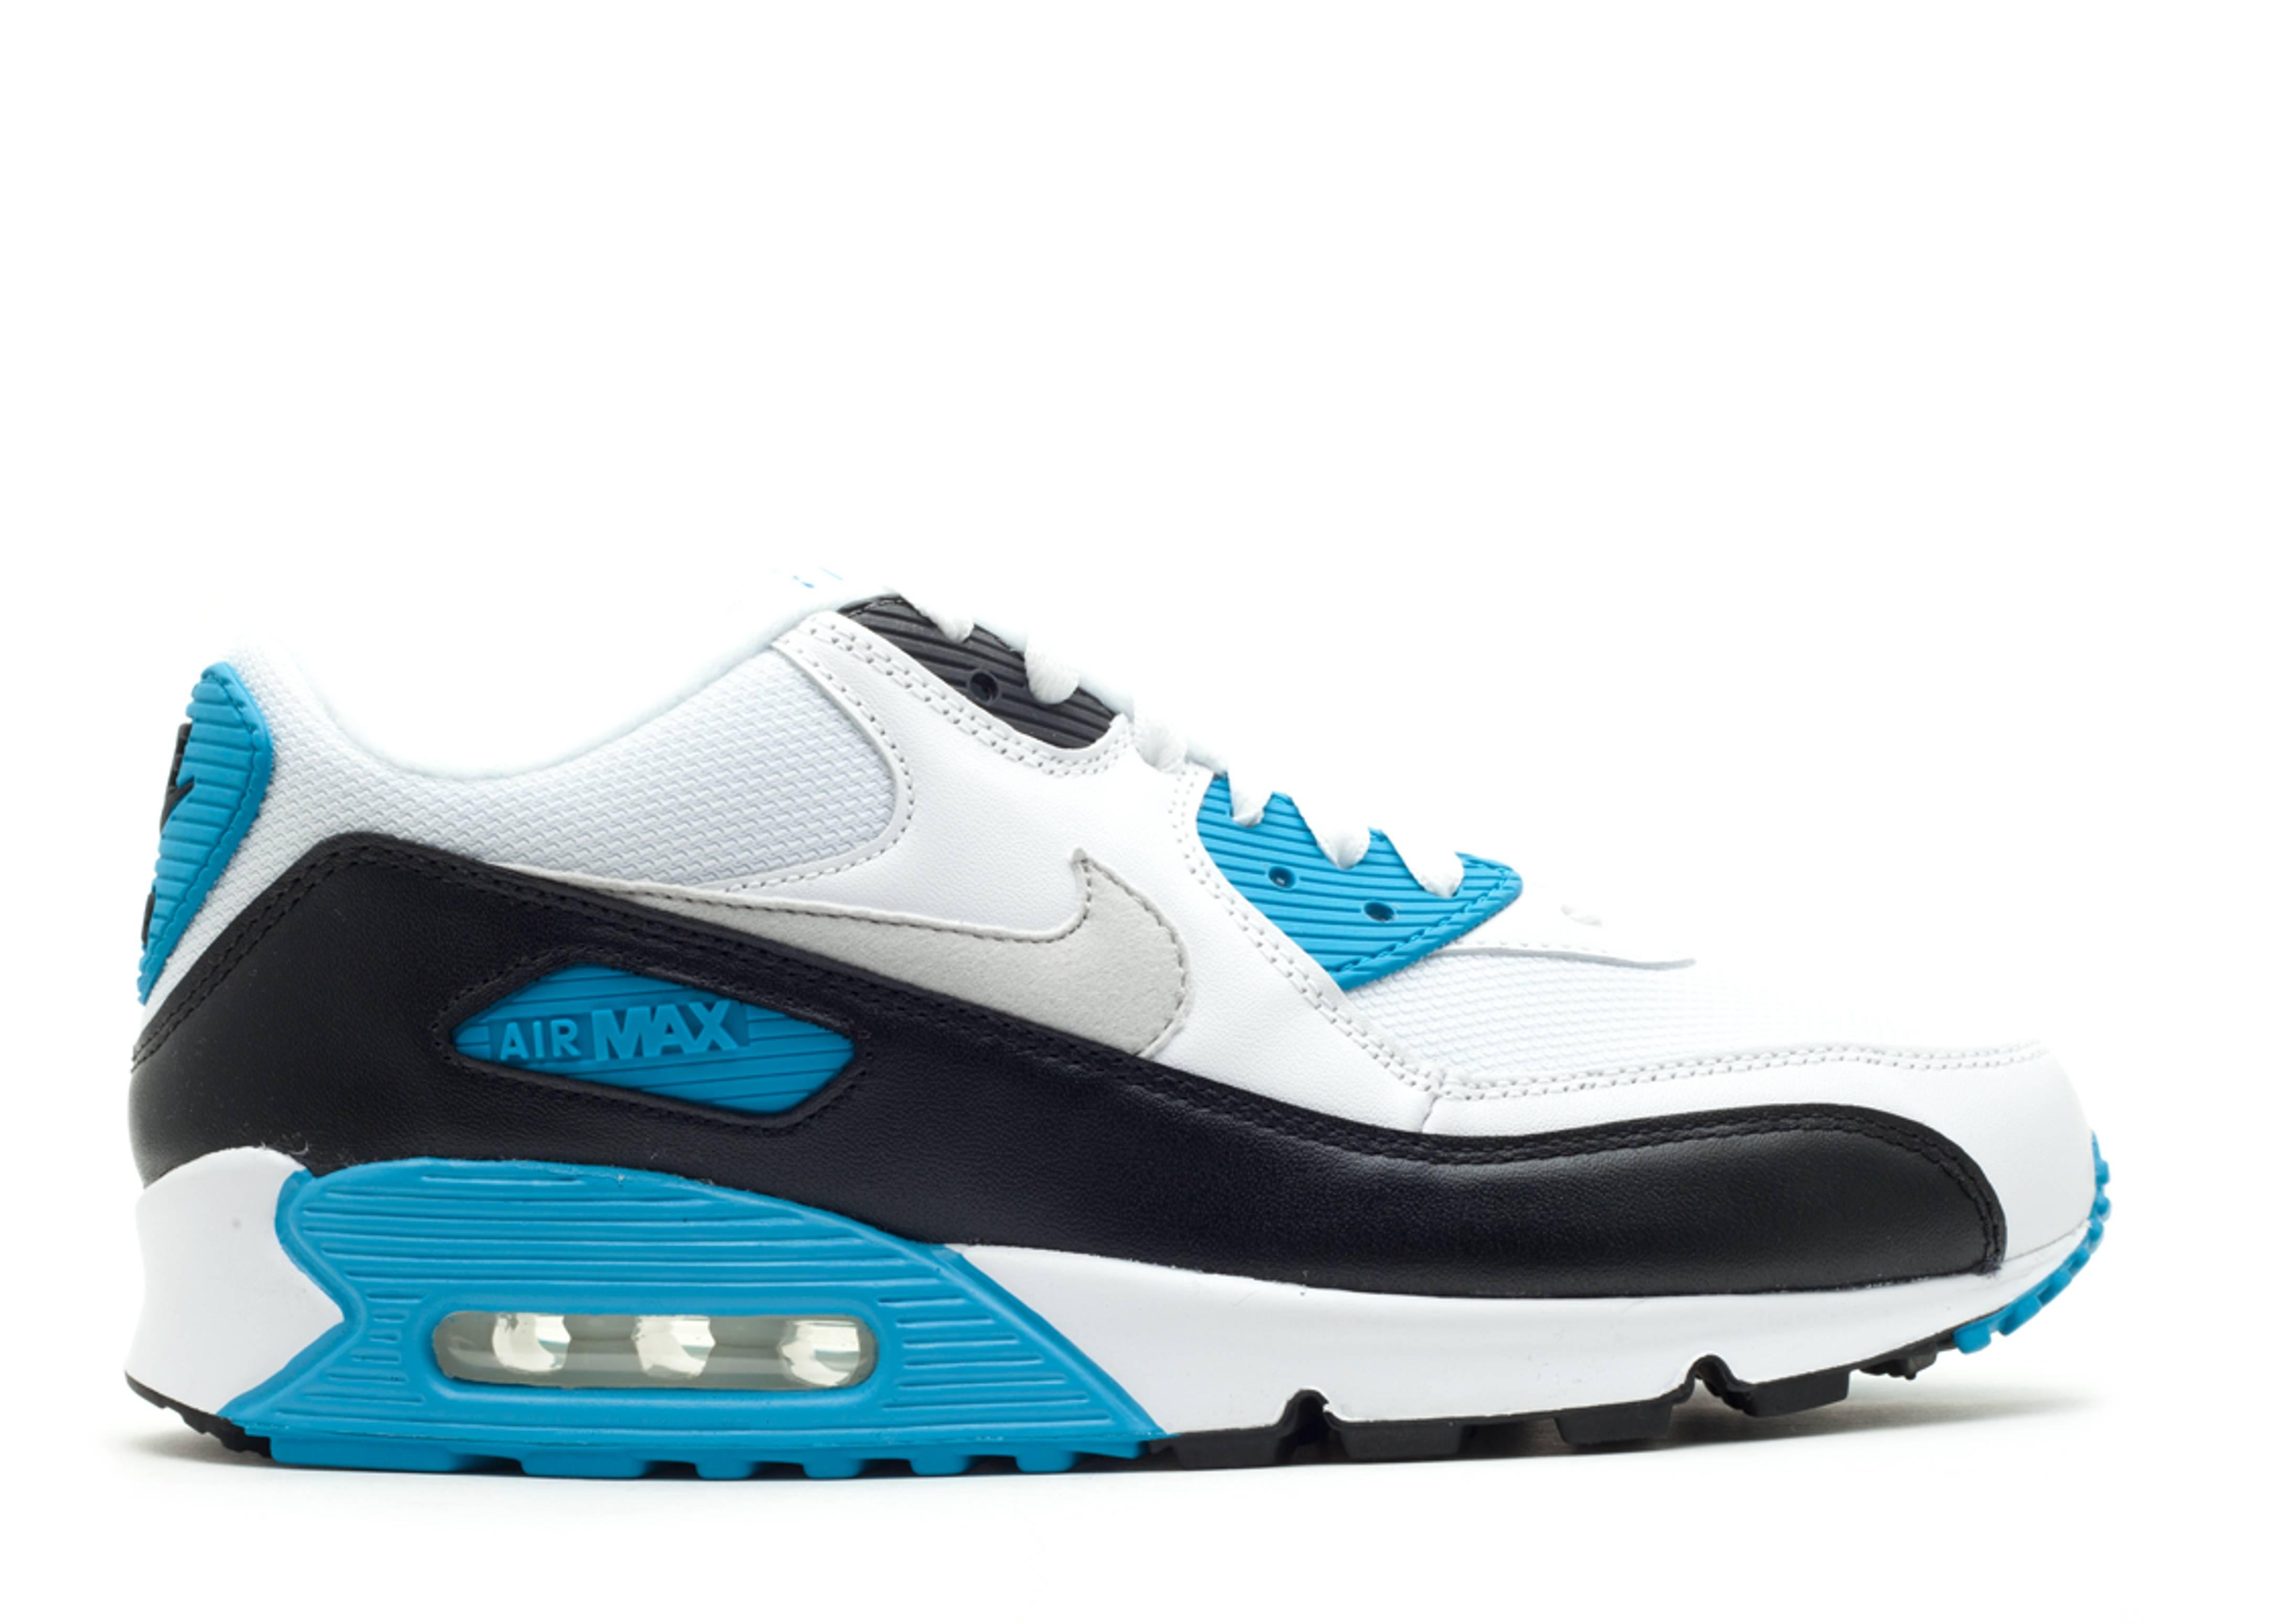 Air Max 90 White Black Zen Grey Nike 325018 108 White Black Zen Grey Flight Club